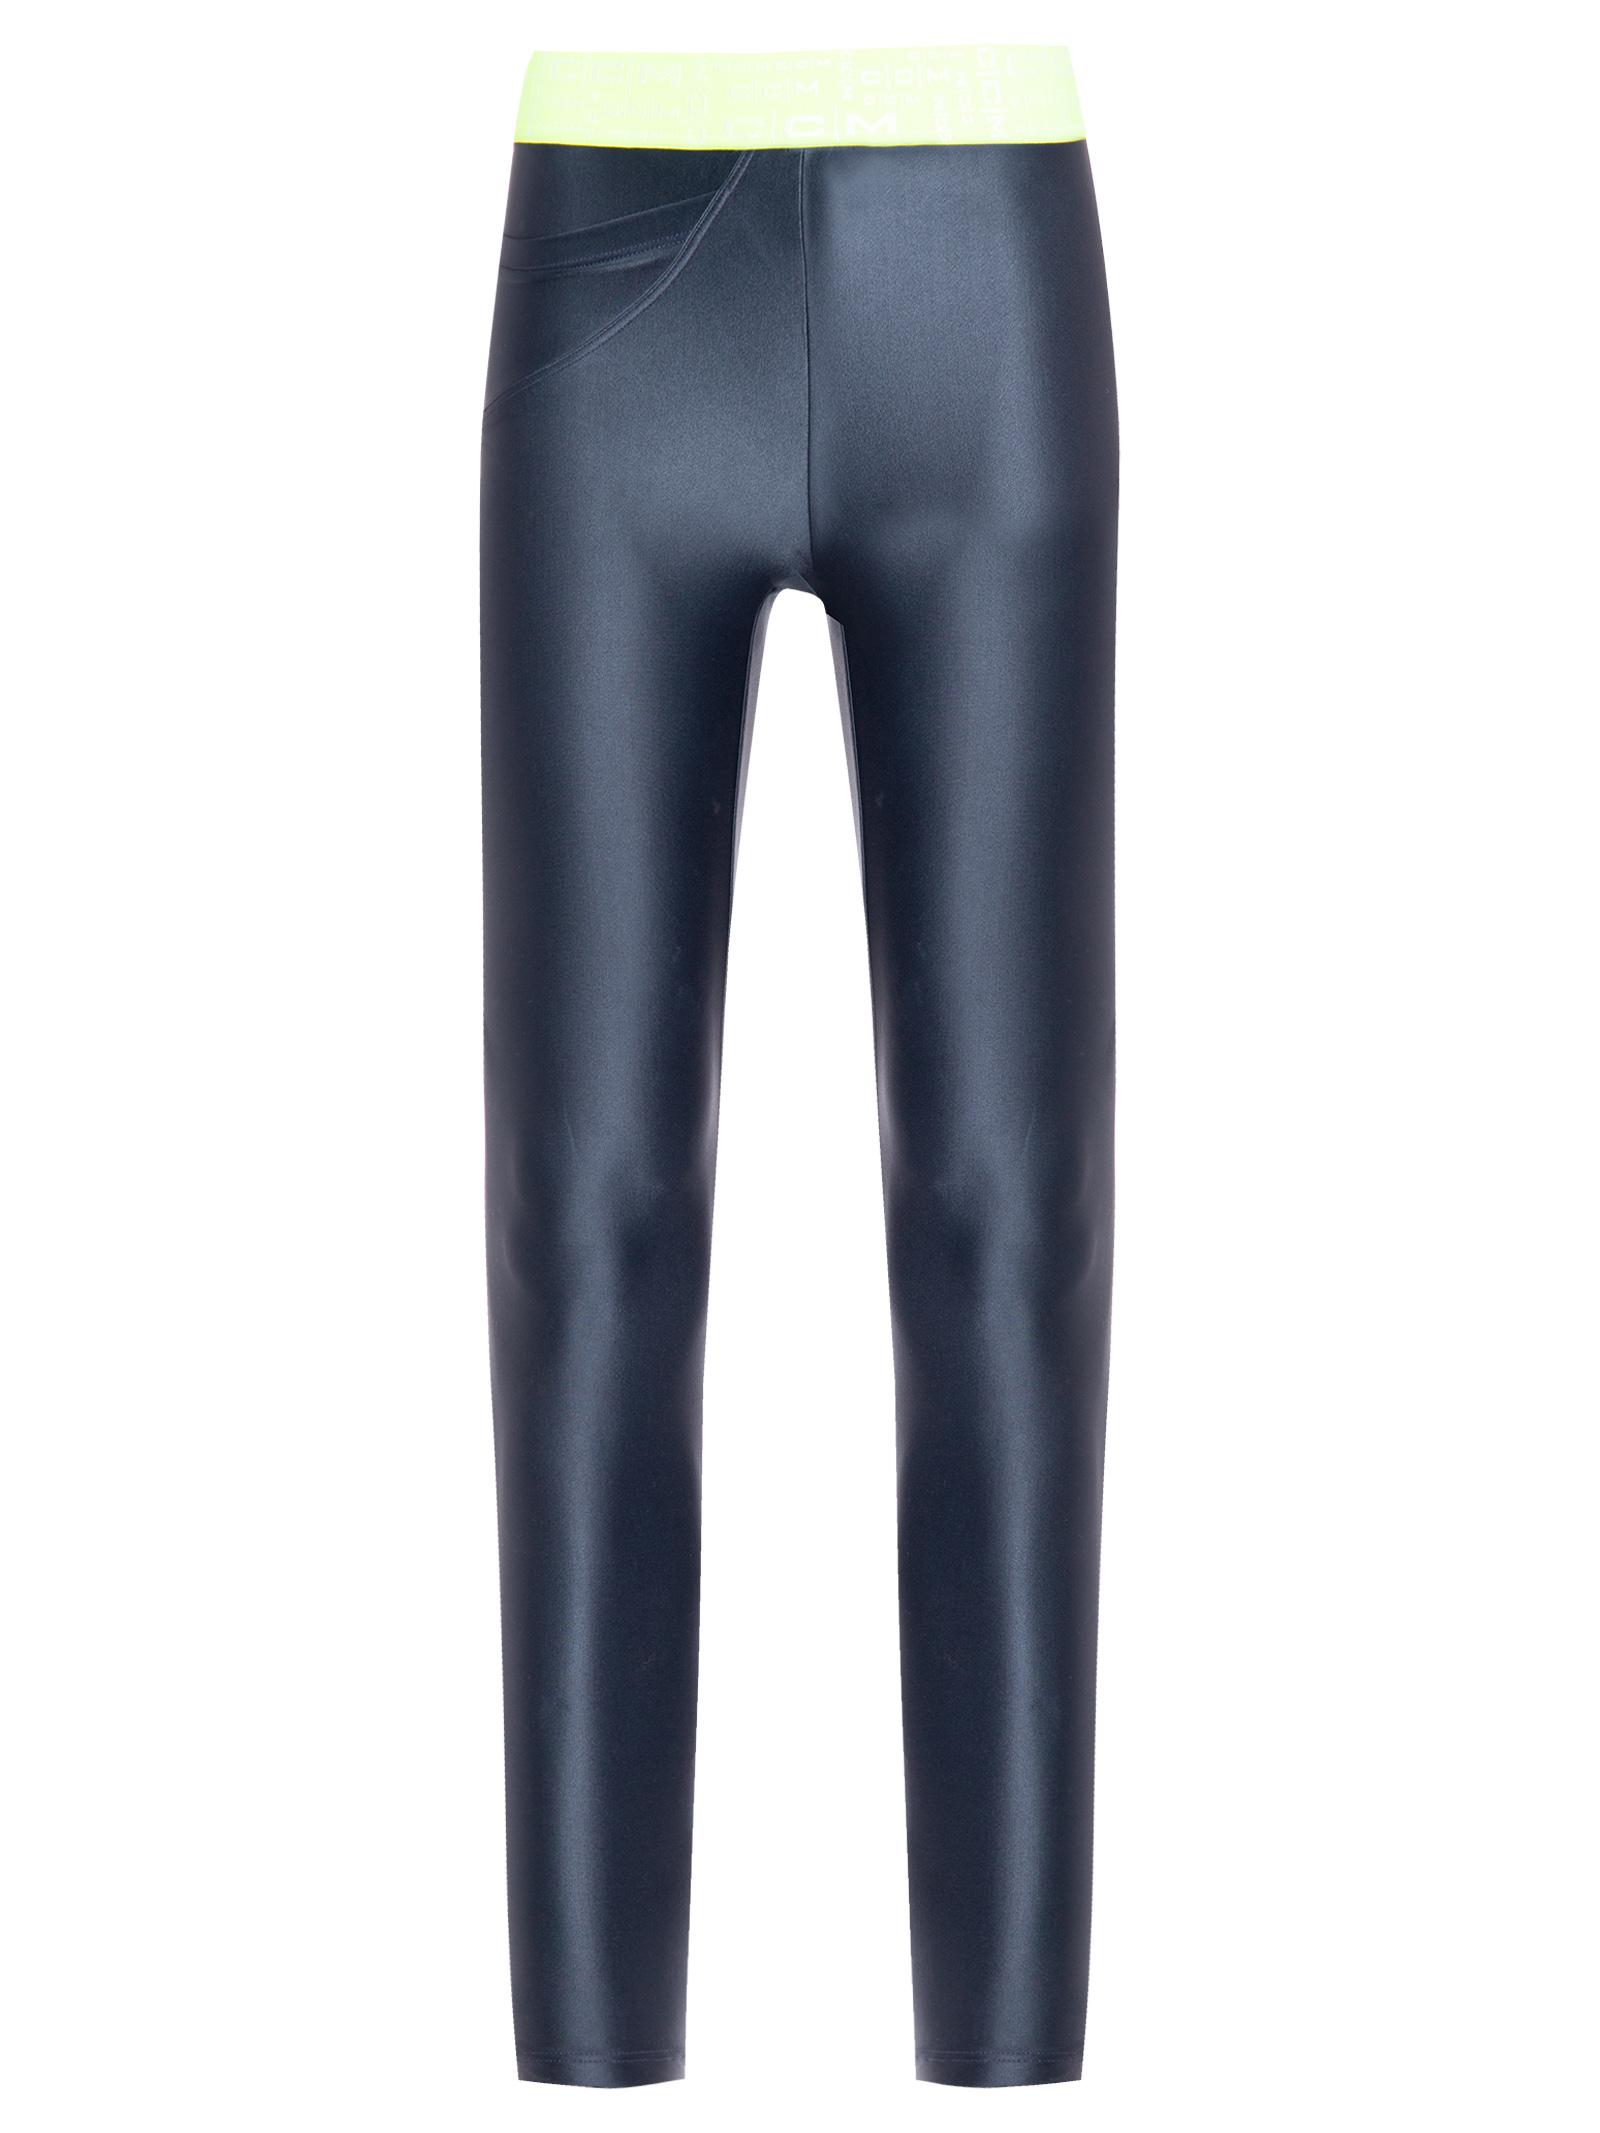 Calça Legging Ail - Azul